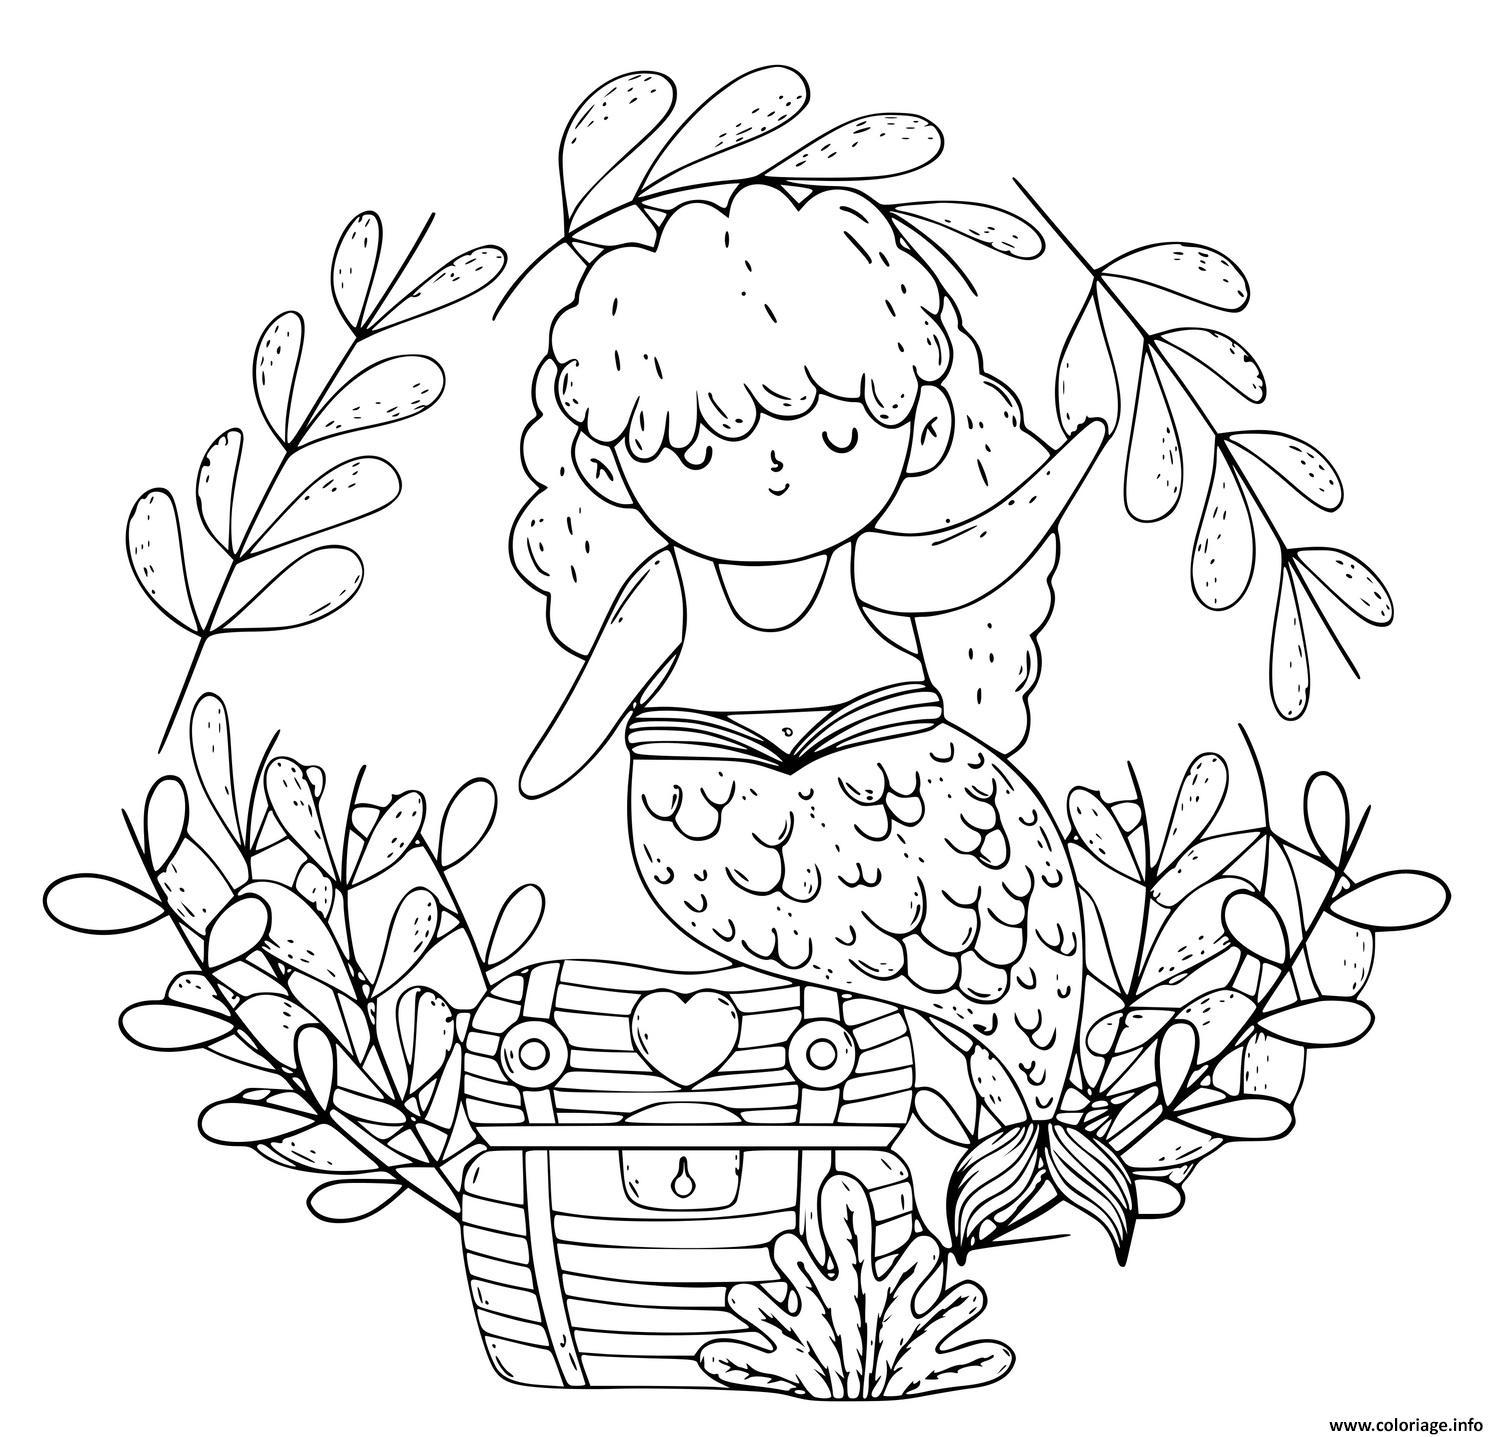 Dessin Petite sirene avec un coffre au tresor Coloriage Gratuit à Imprimer